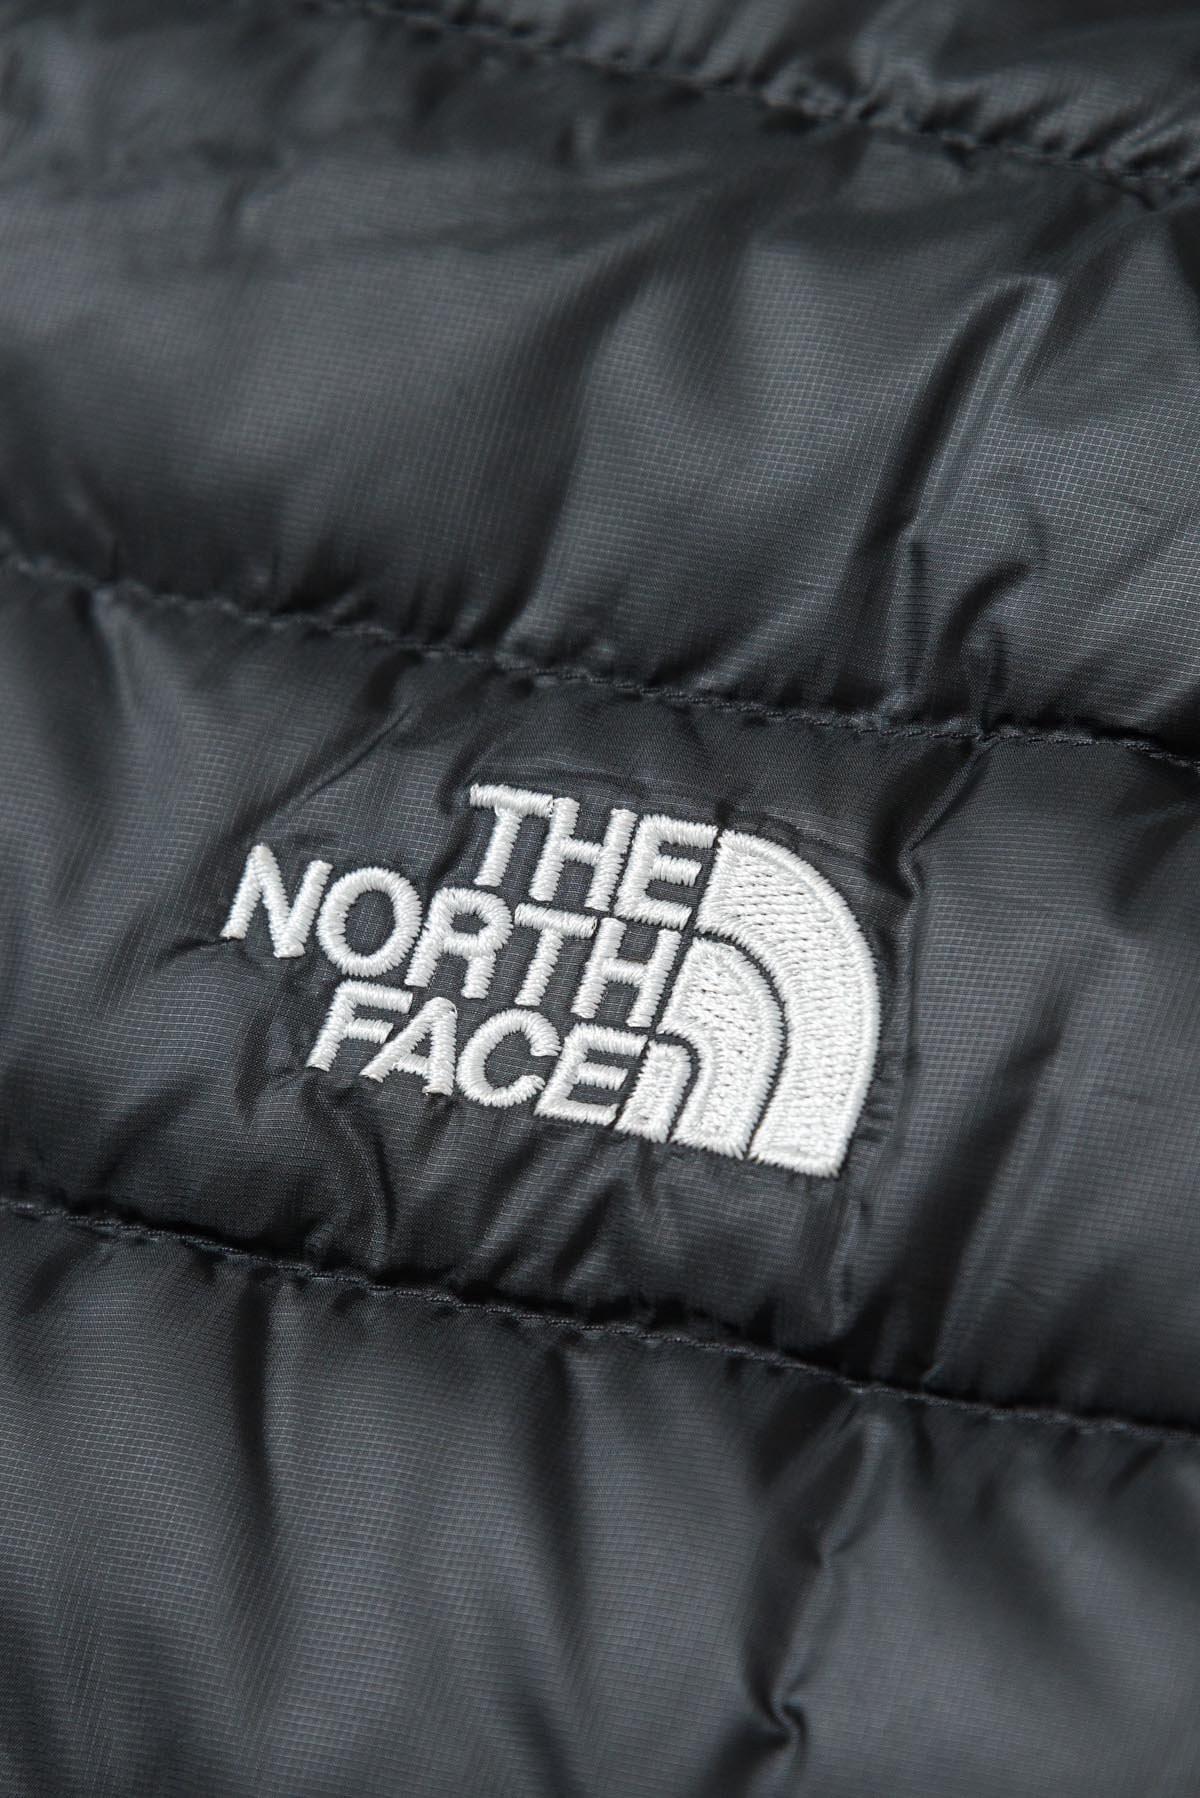 North Face Trevail Daunenjacke